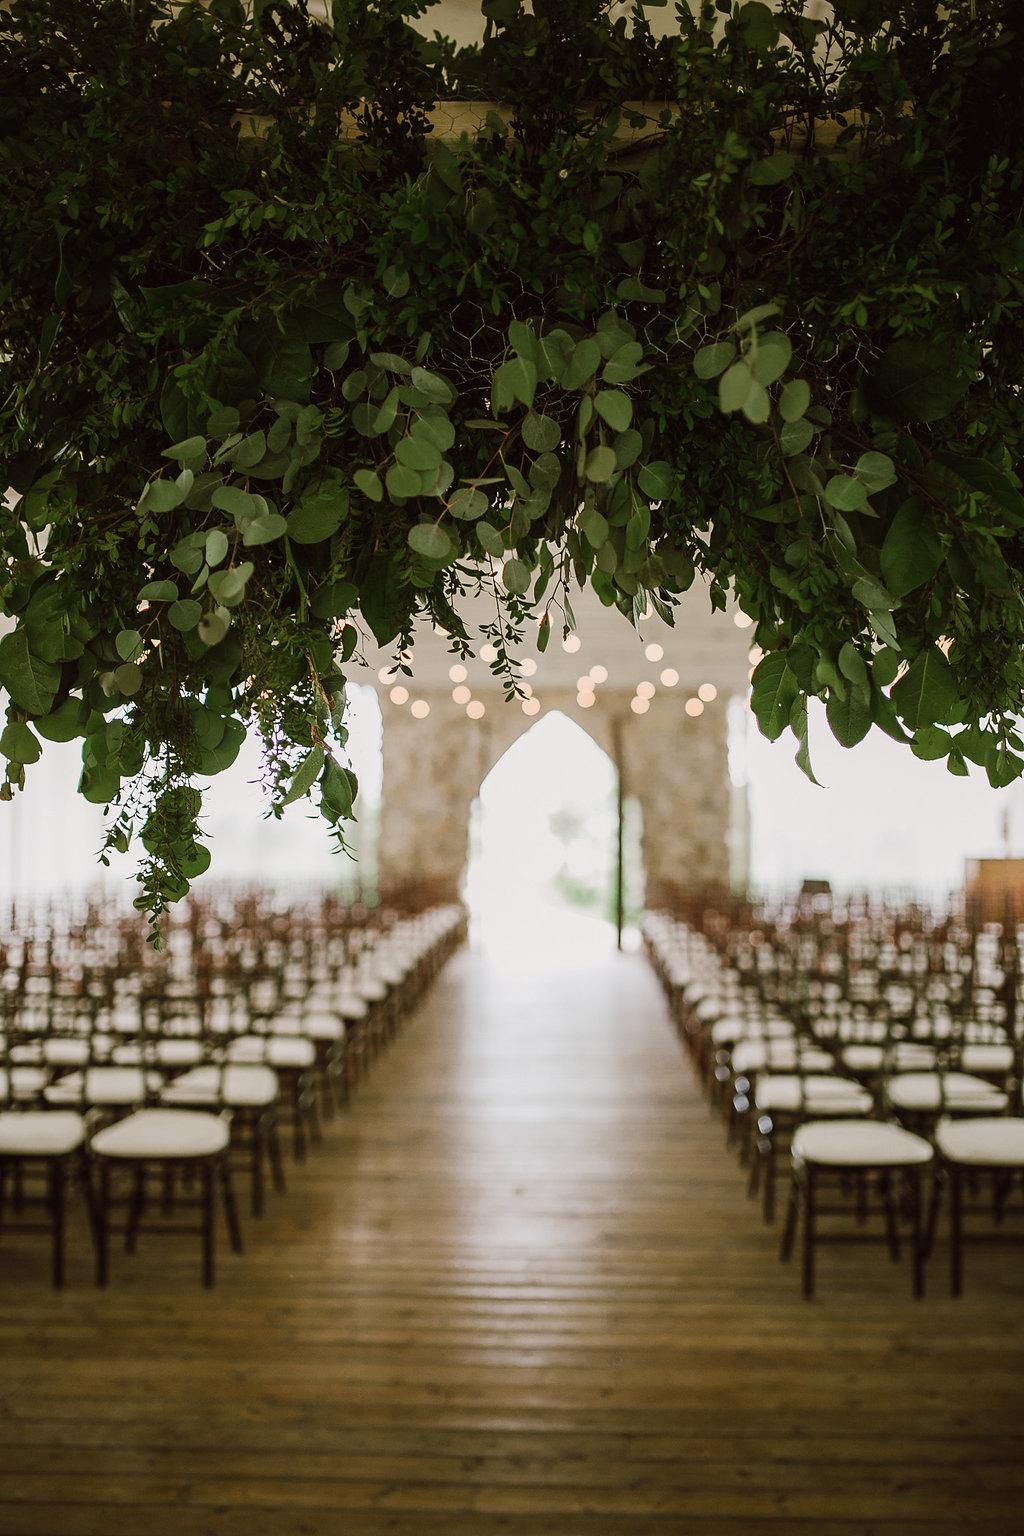 Hanging Greenery Installation - Wedding Decor at Cielo's Garden